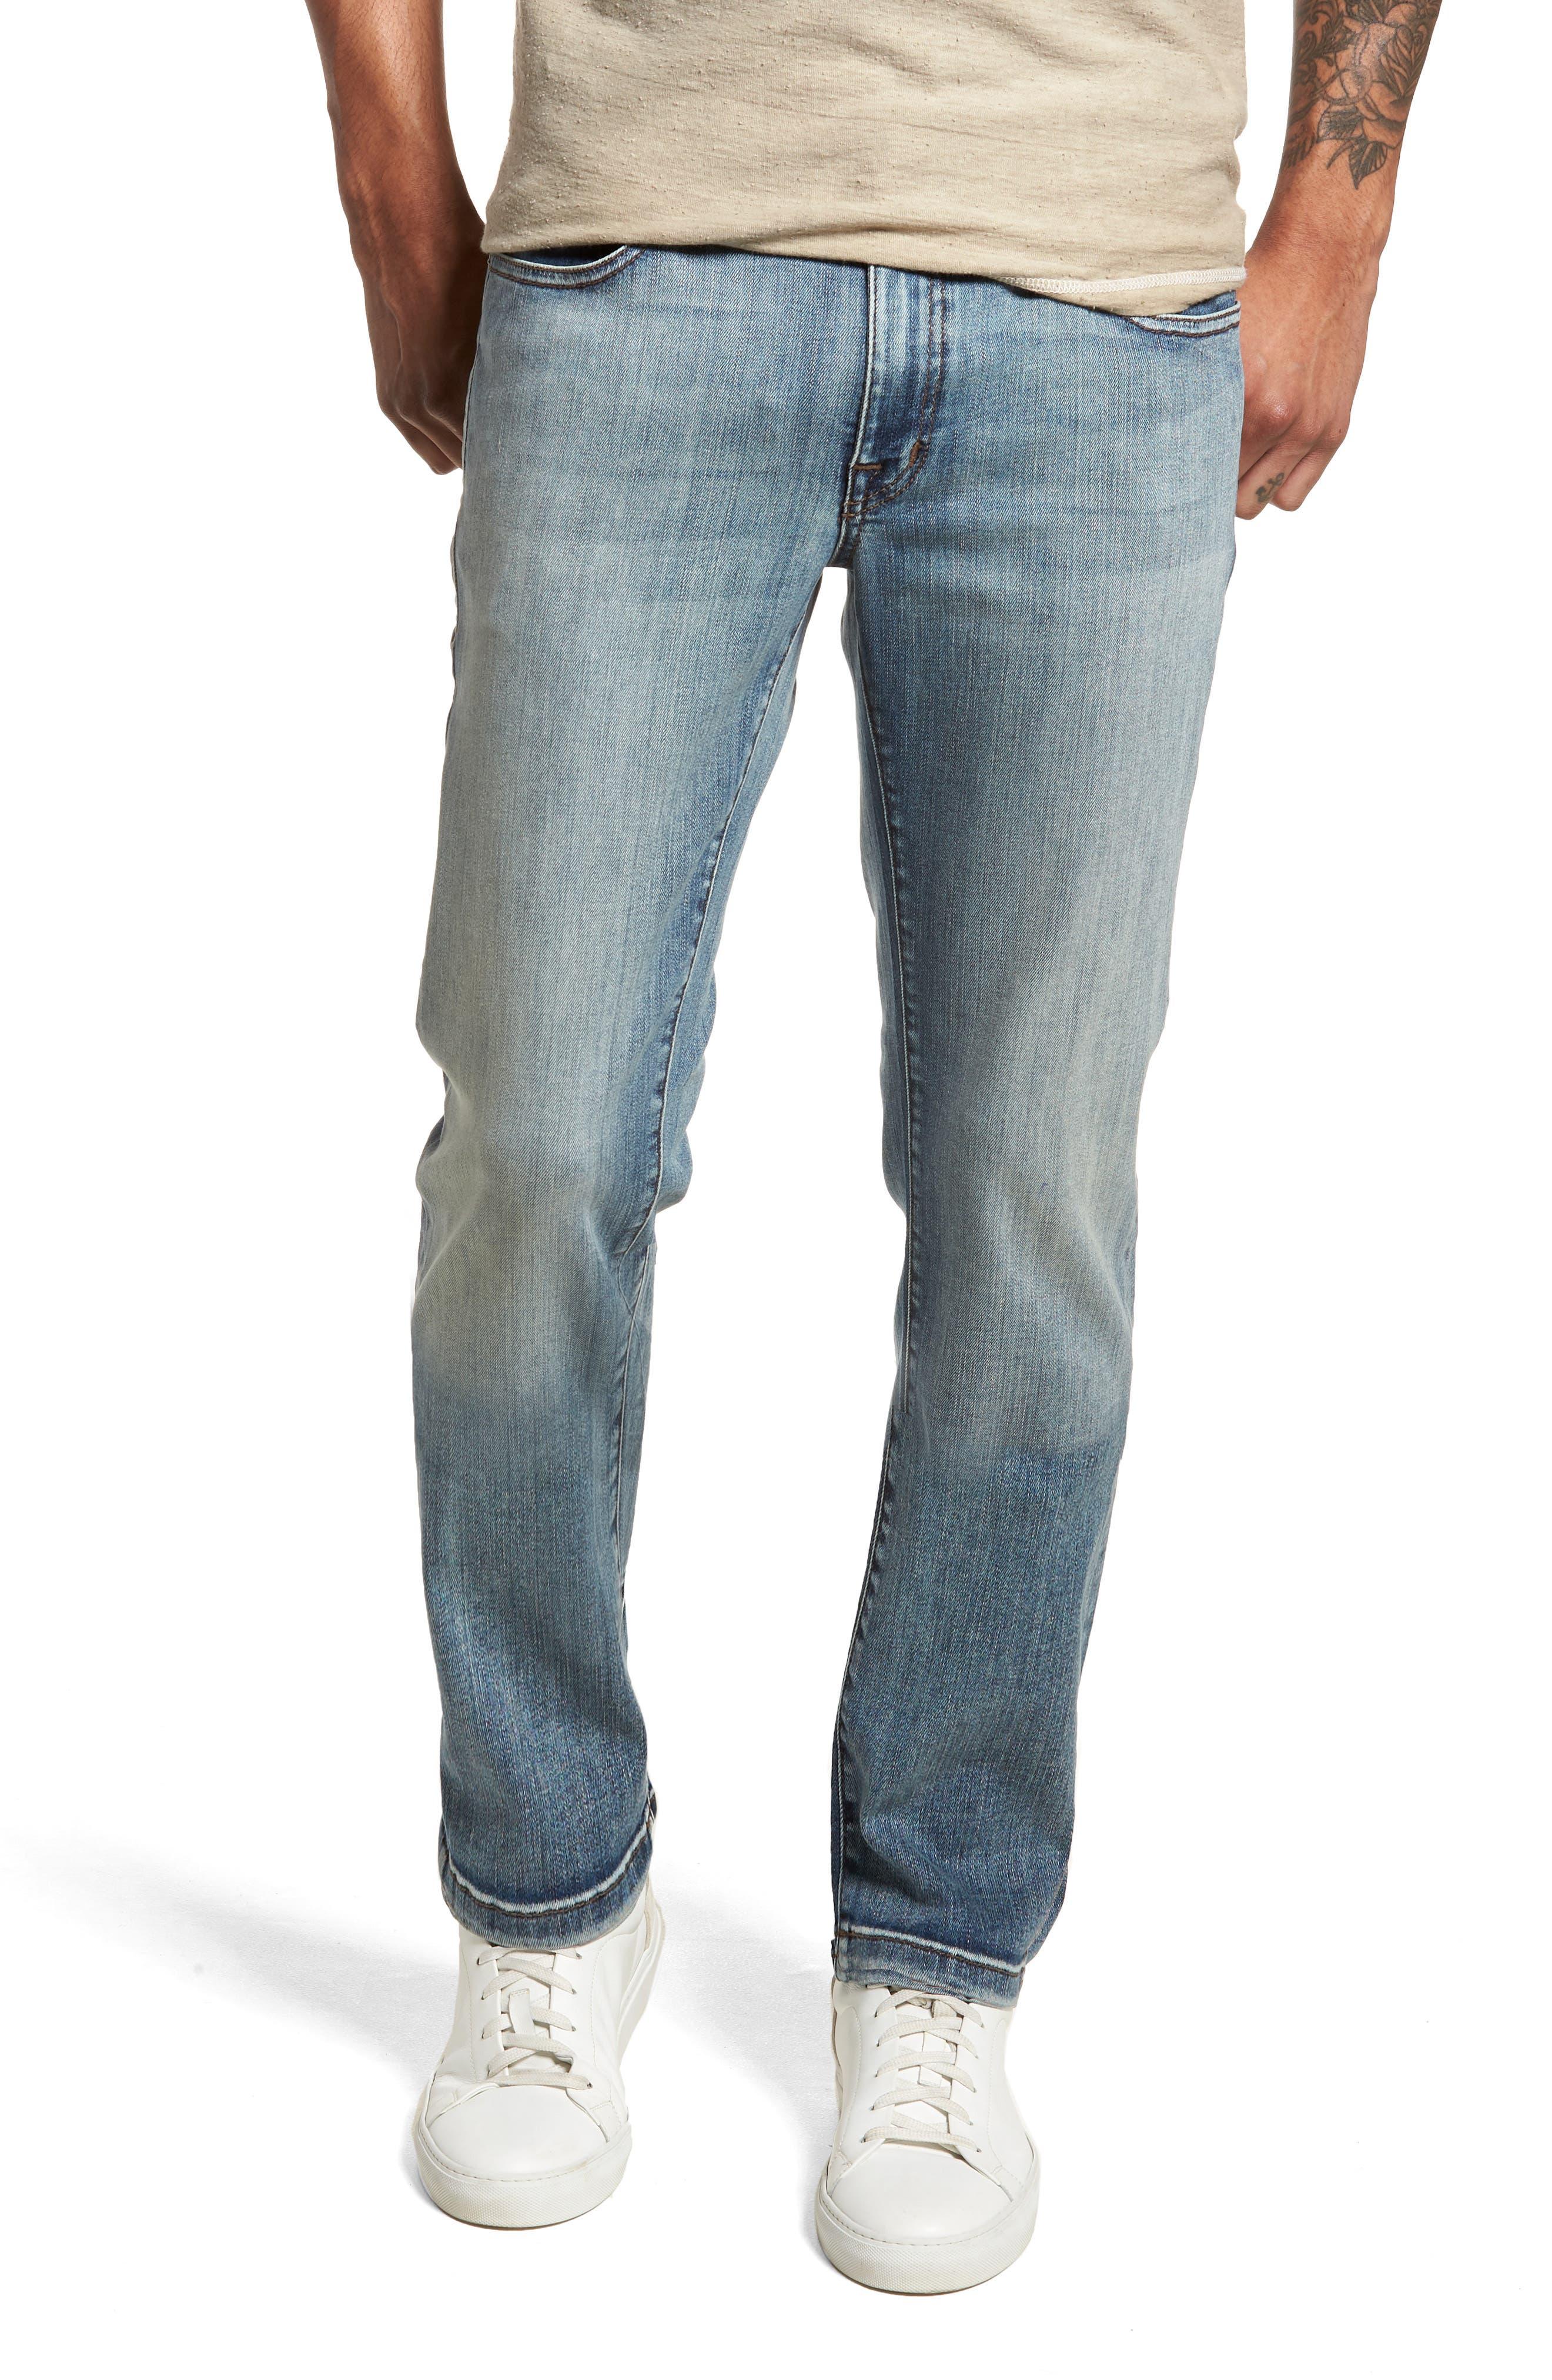 Fidelity Denim Jimmy Slim Fit Jeans (Santana Blue)